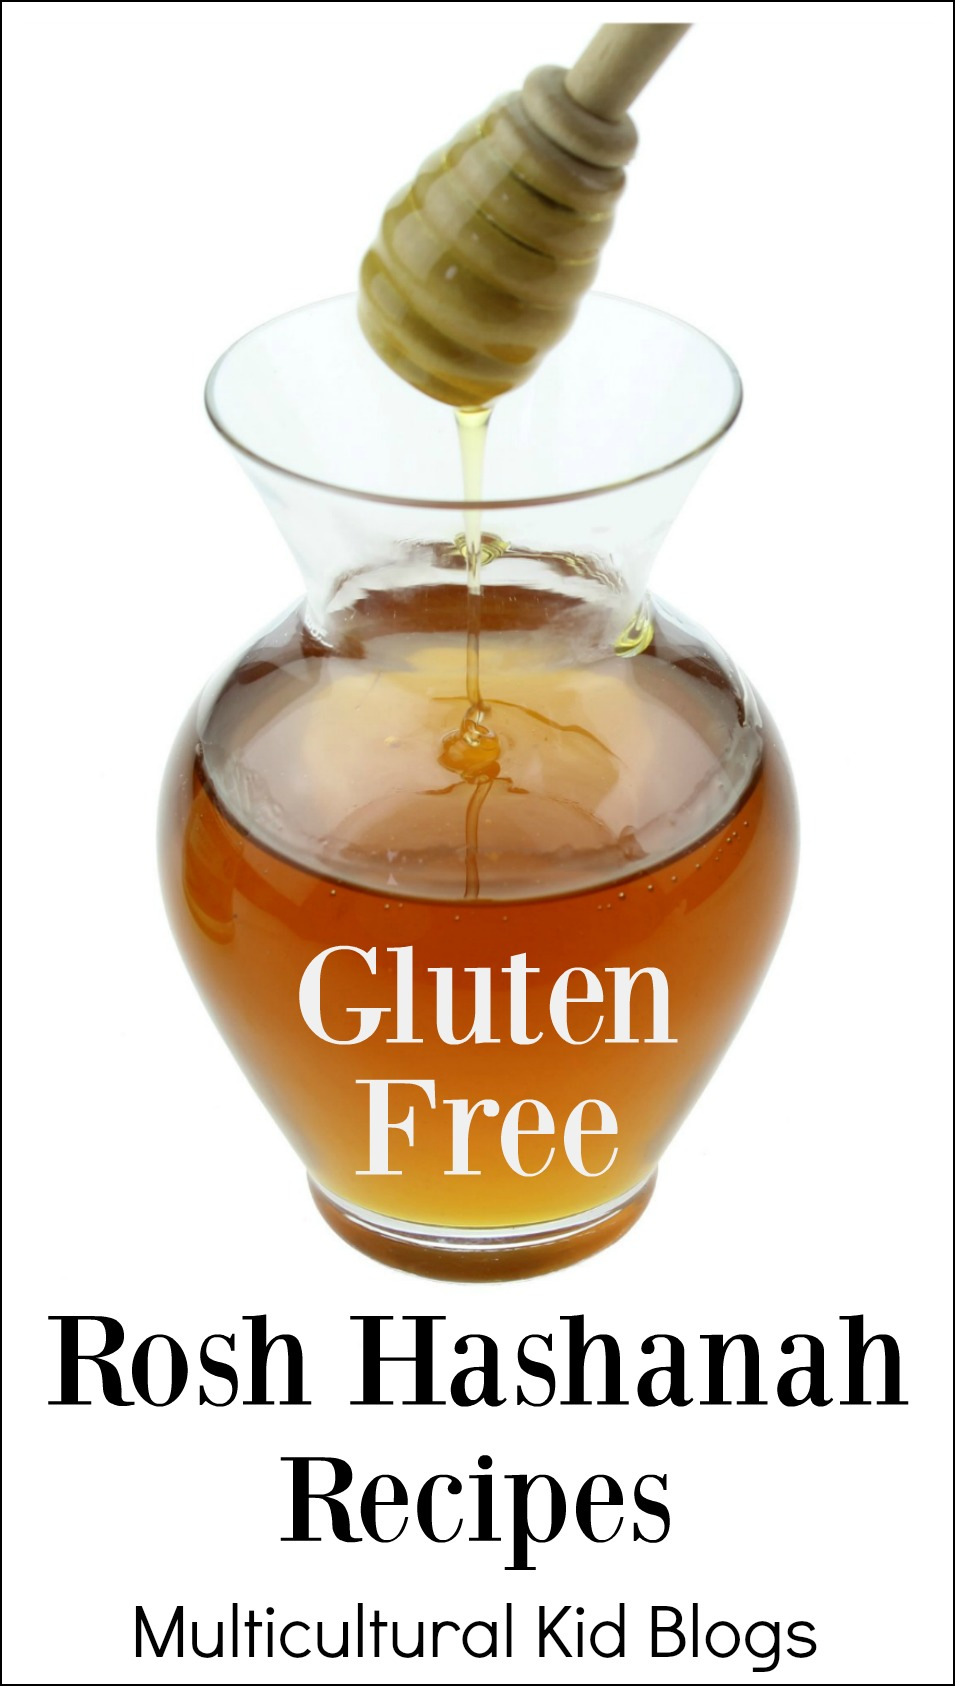 Gluten free Rosh Hashanah recipes